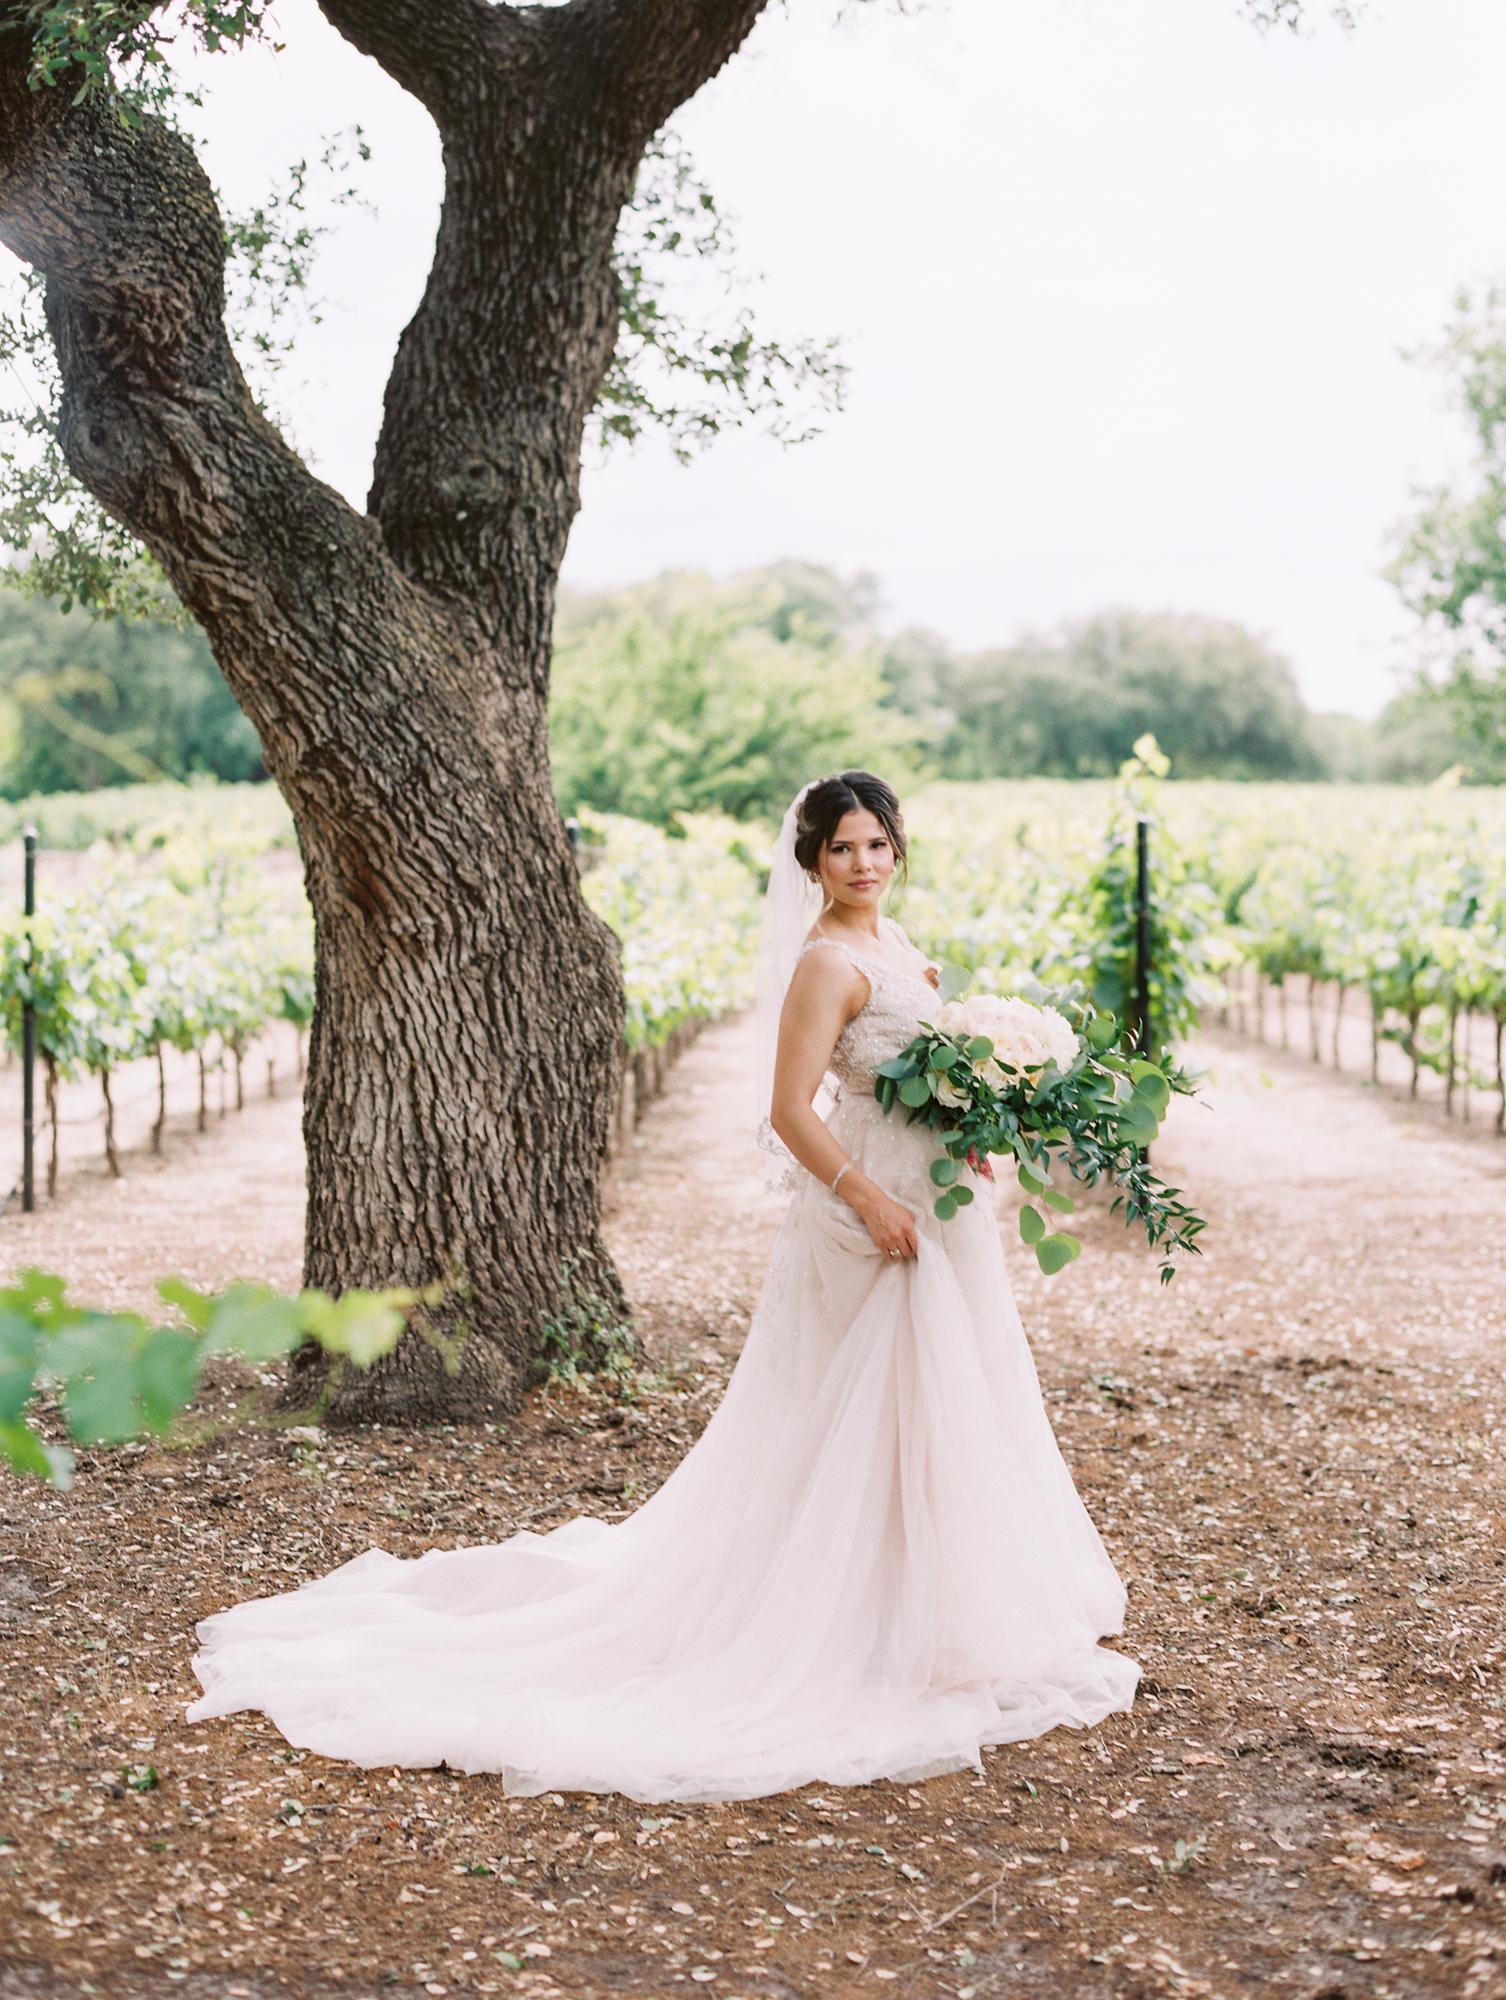 Elegant Spring Vineyard Wedding | Film Wedding Photographer | Austin Wedding Photographer | Bride's Wedding Day Portrait | Britni Dean Photography // britnidean.com